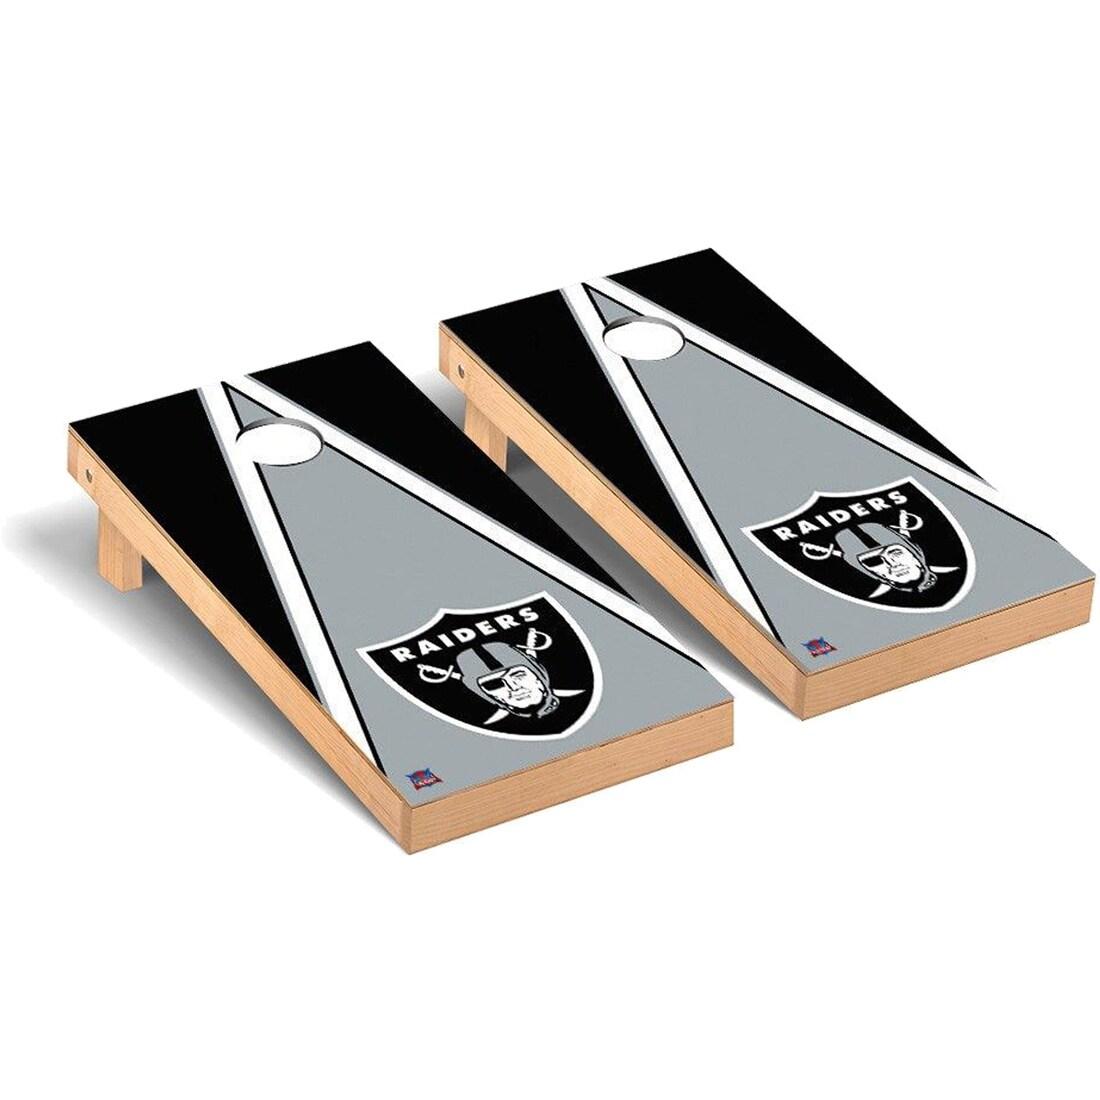 Las Vegas Raiders 2' x 4' Triangle Cornhole Board Tailgate Toss Set